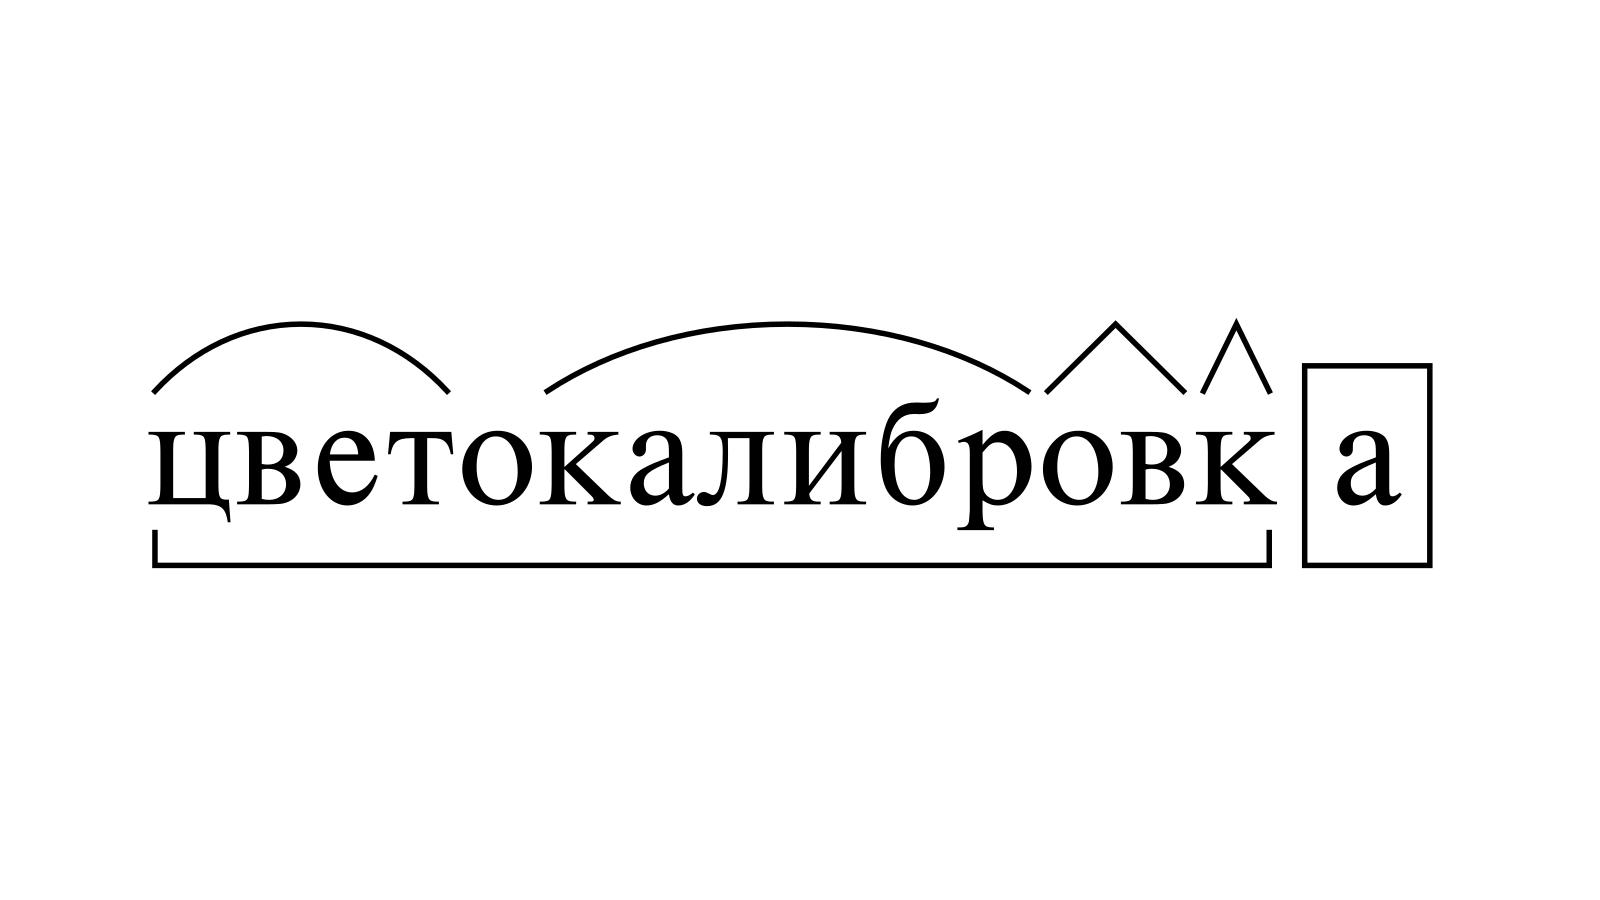 Разбор слова «цветокалибровка» по составу